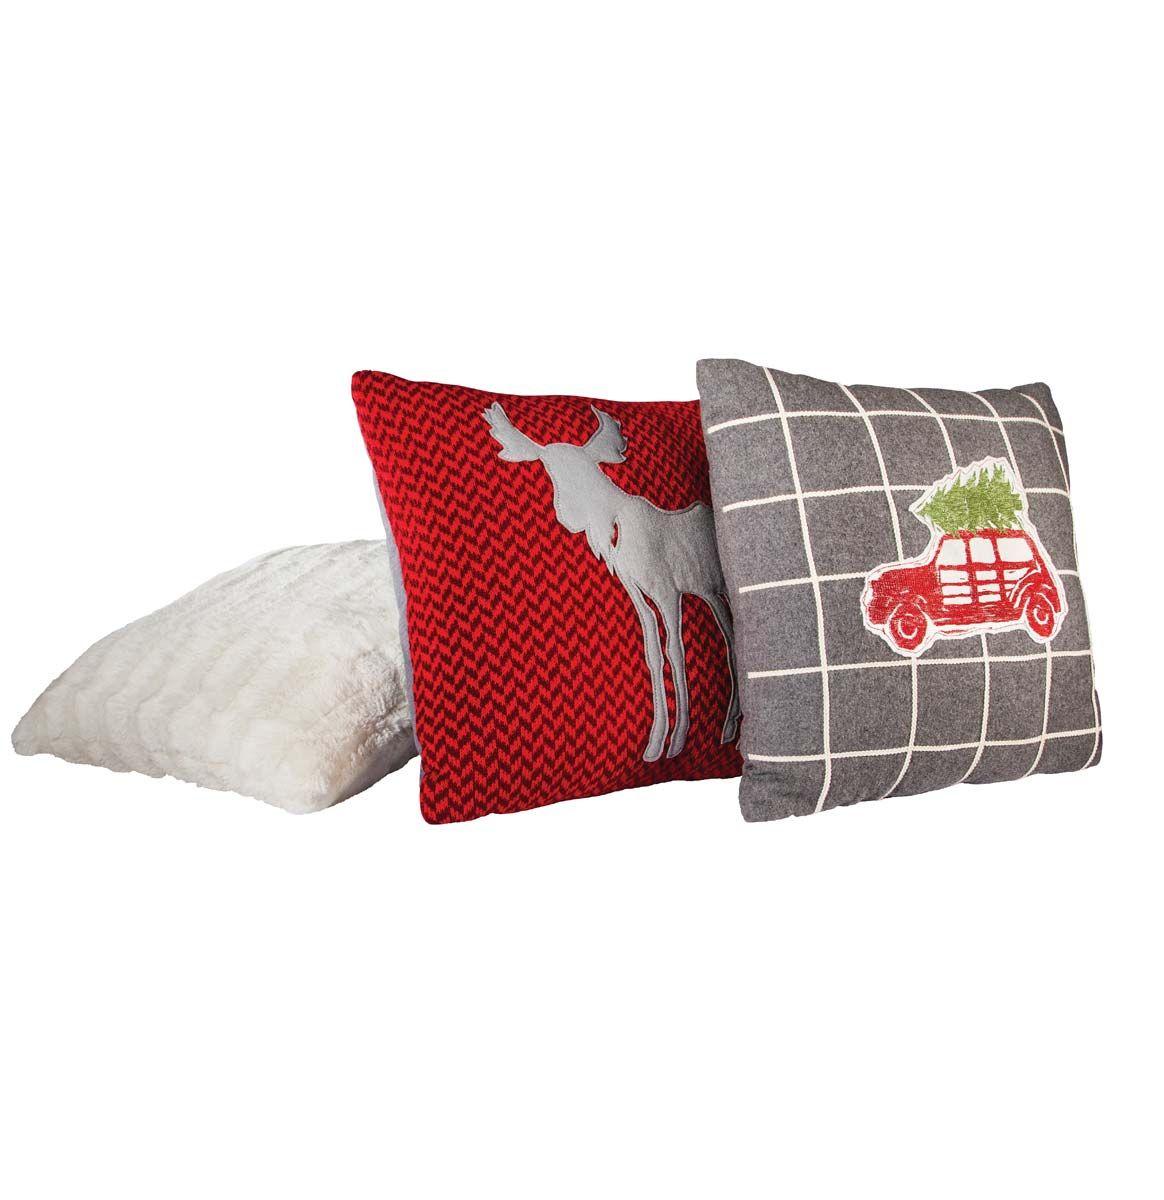 Throw Pillows - Target Holiday Look Book Sneak Peek: 19 Best Items ...